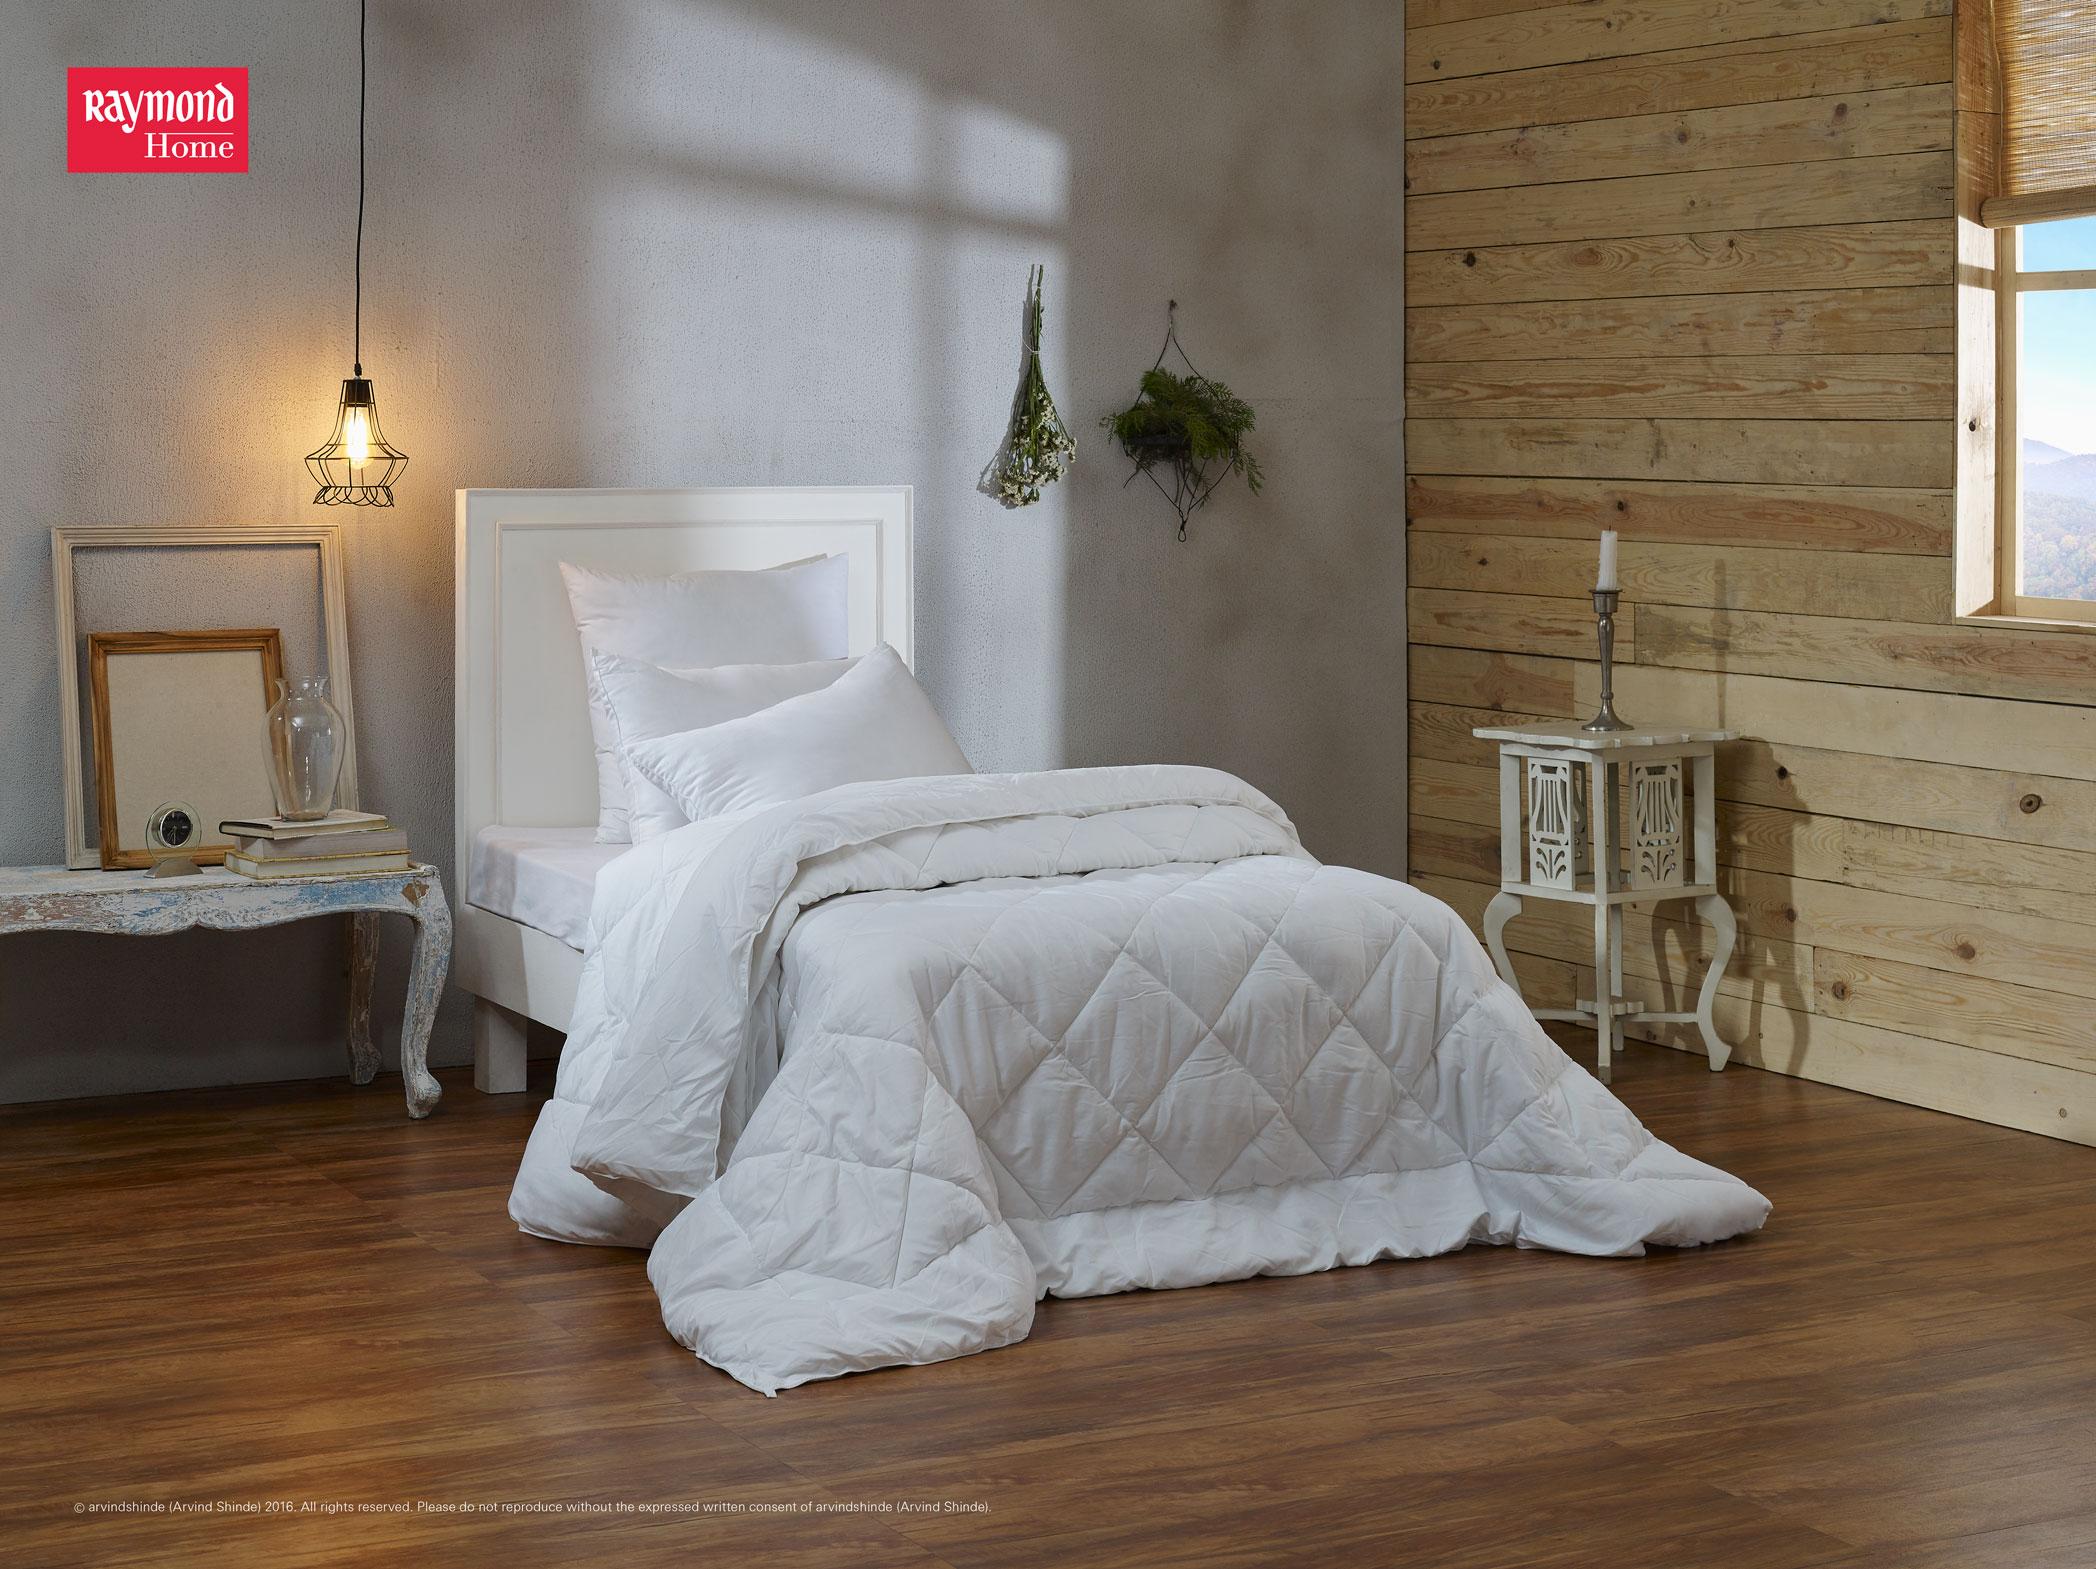 Raymond-home-Blanket-TRENDY-BED-ROOM